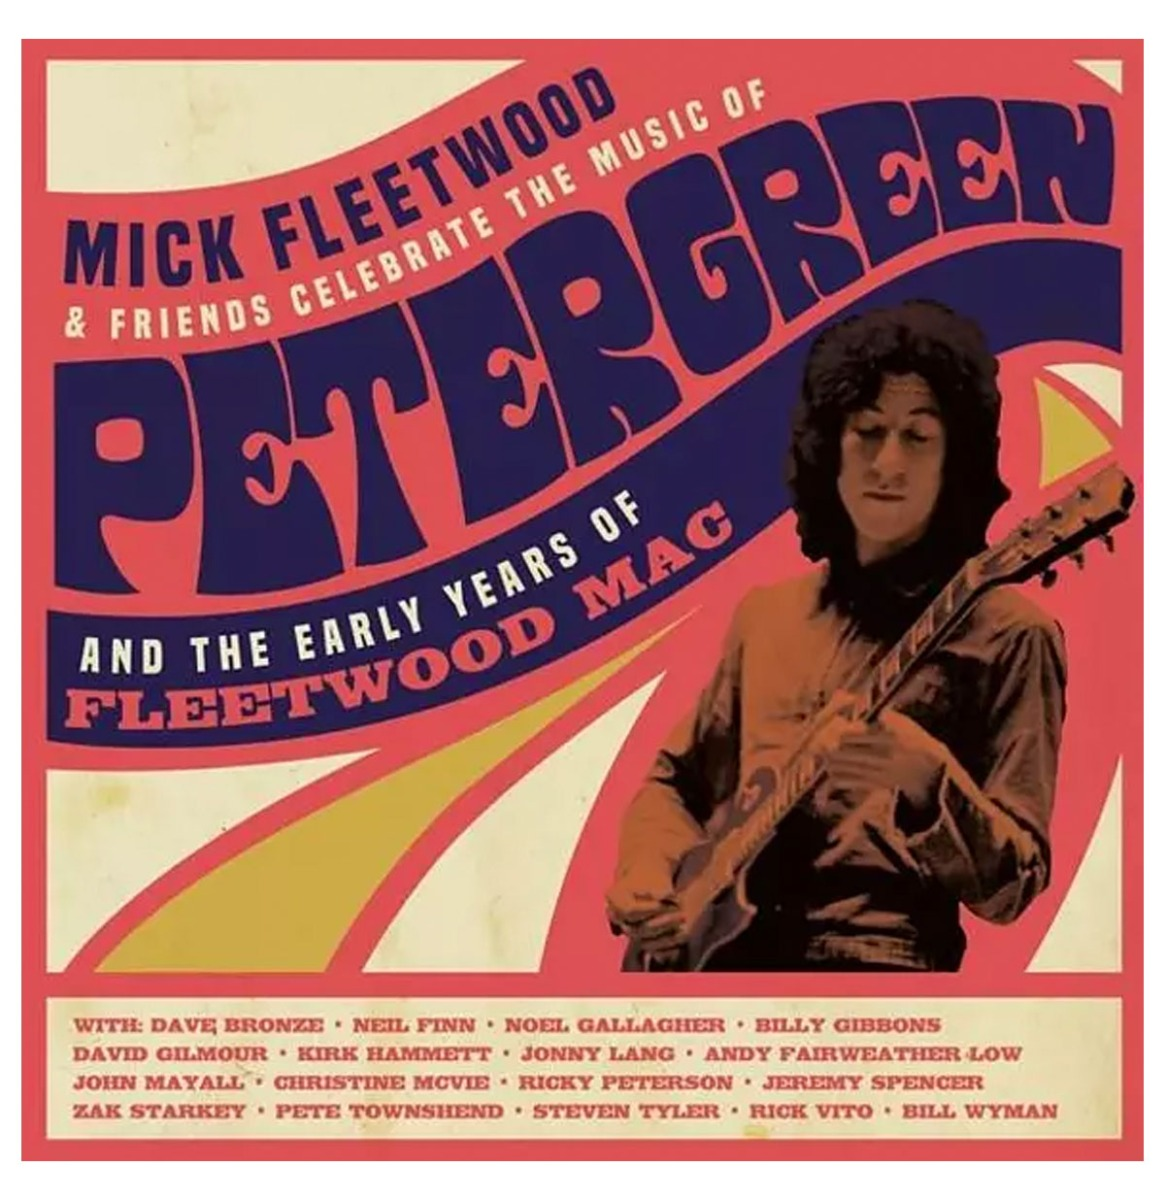 Mick Fleetwood & Friends Celebrate the Music of Peter Green 4LP Box